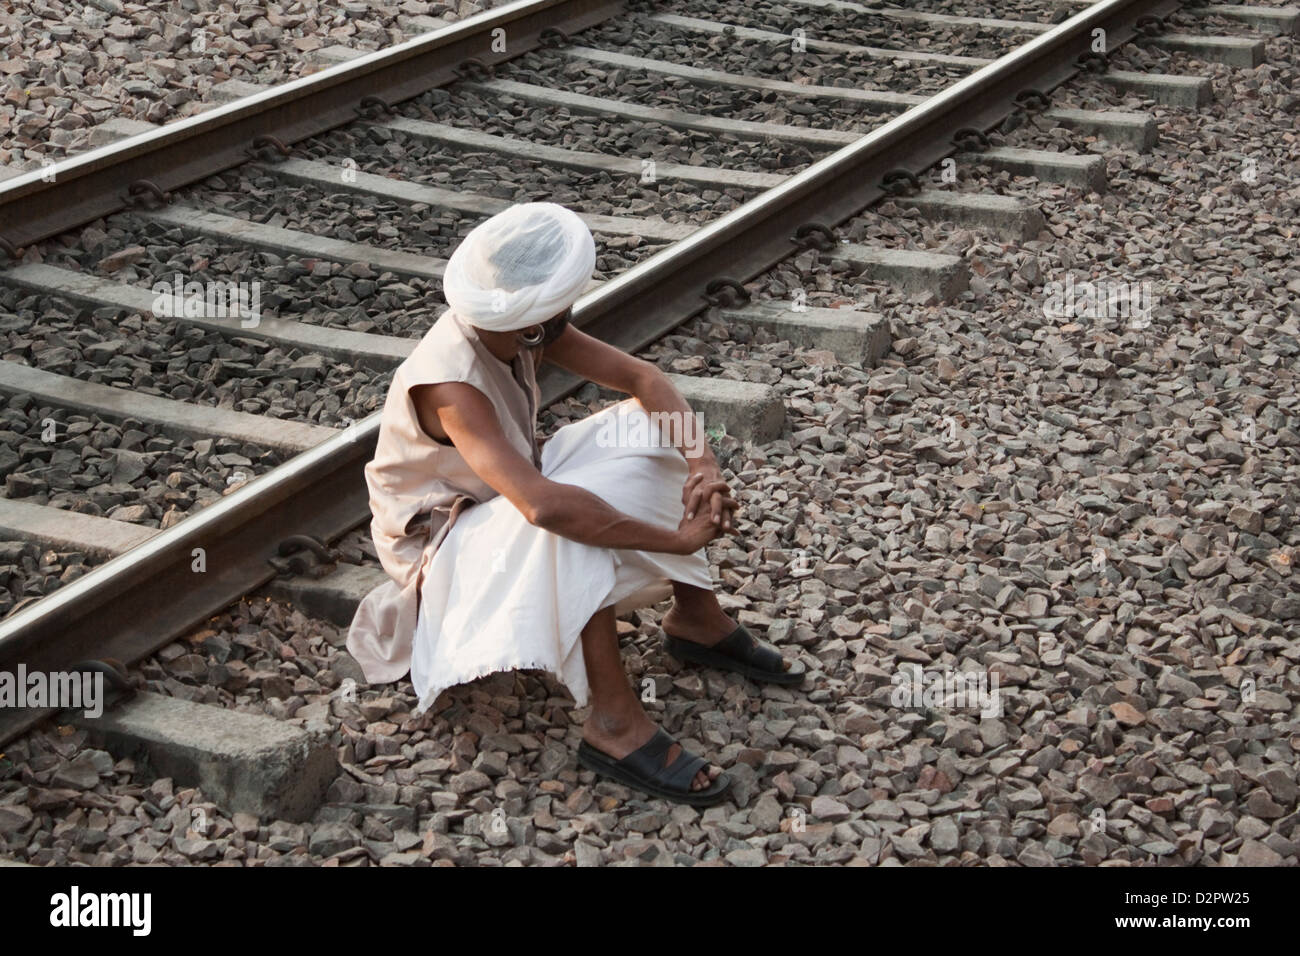 Man sitting near railroad track, Ahmedabad, Gujarat, India - Stock Image